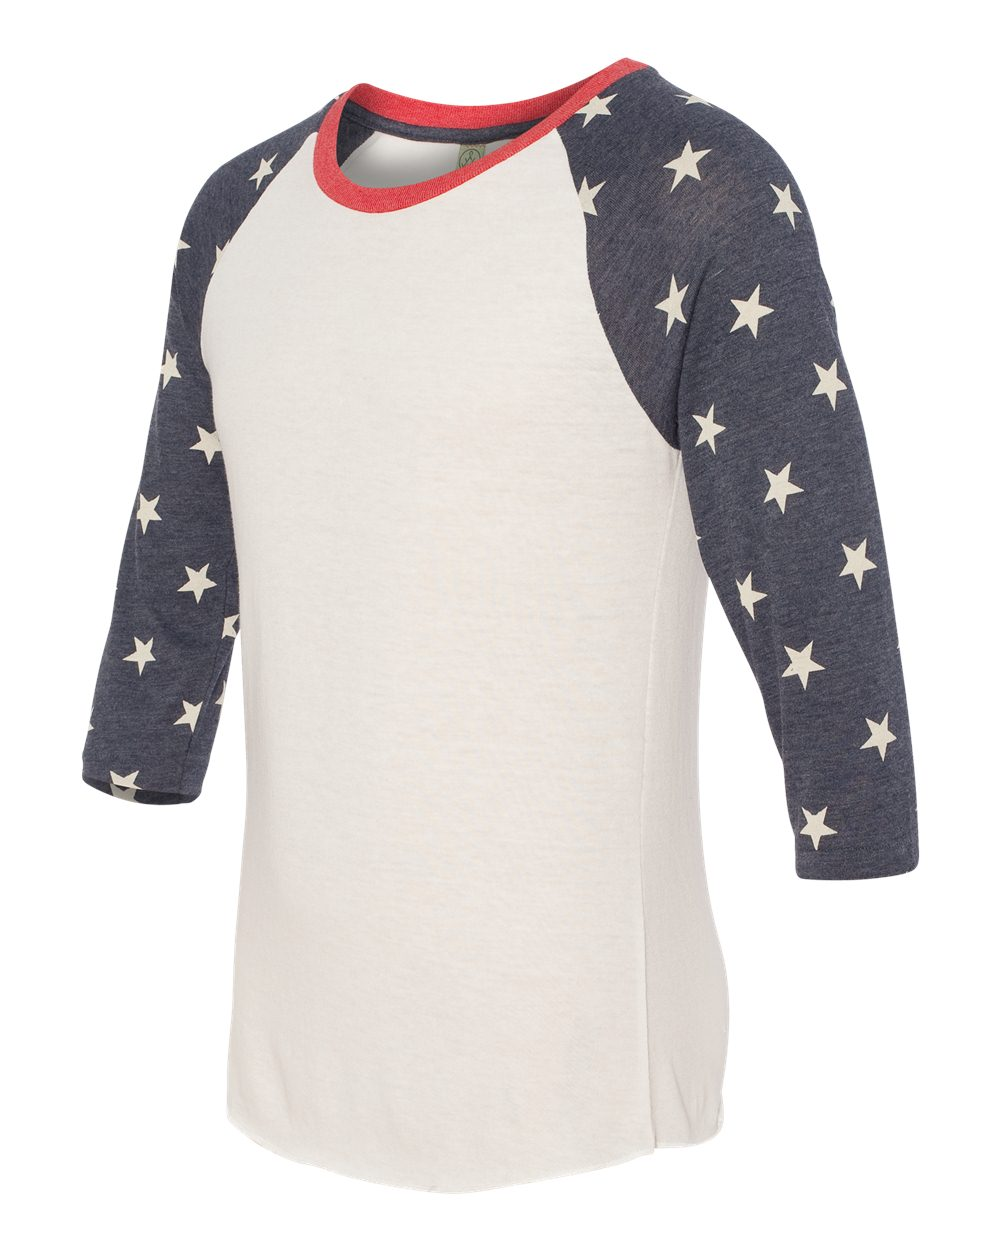 Alternative 2089ea printed eco jersey baseball raglan t for 4 color process t shirt printing